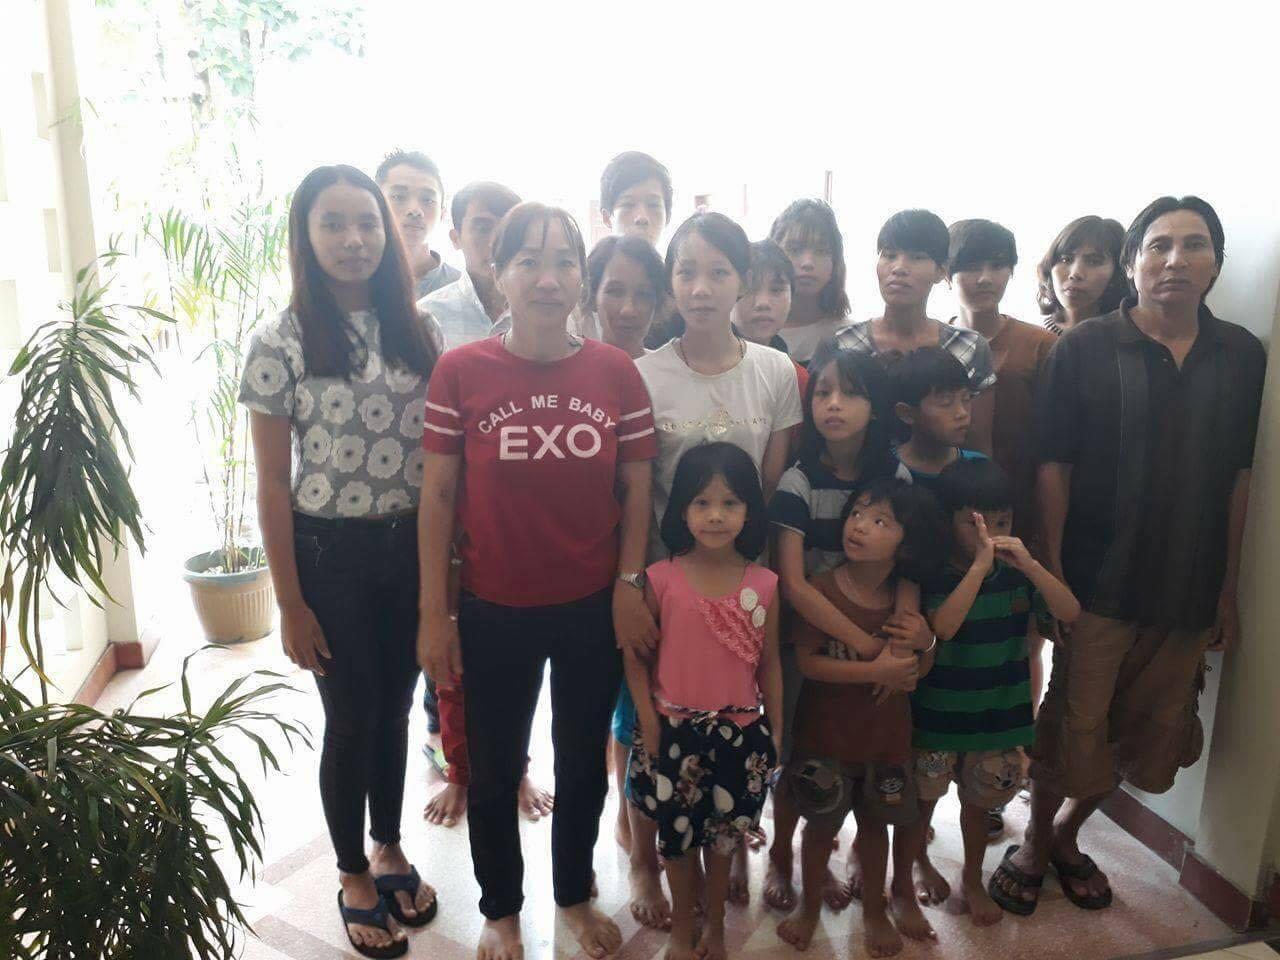 The group of 18 asylum seekers in Indonesia.(Photo Courtesy: Võ An Đôn)